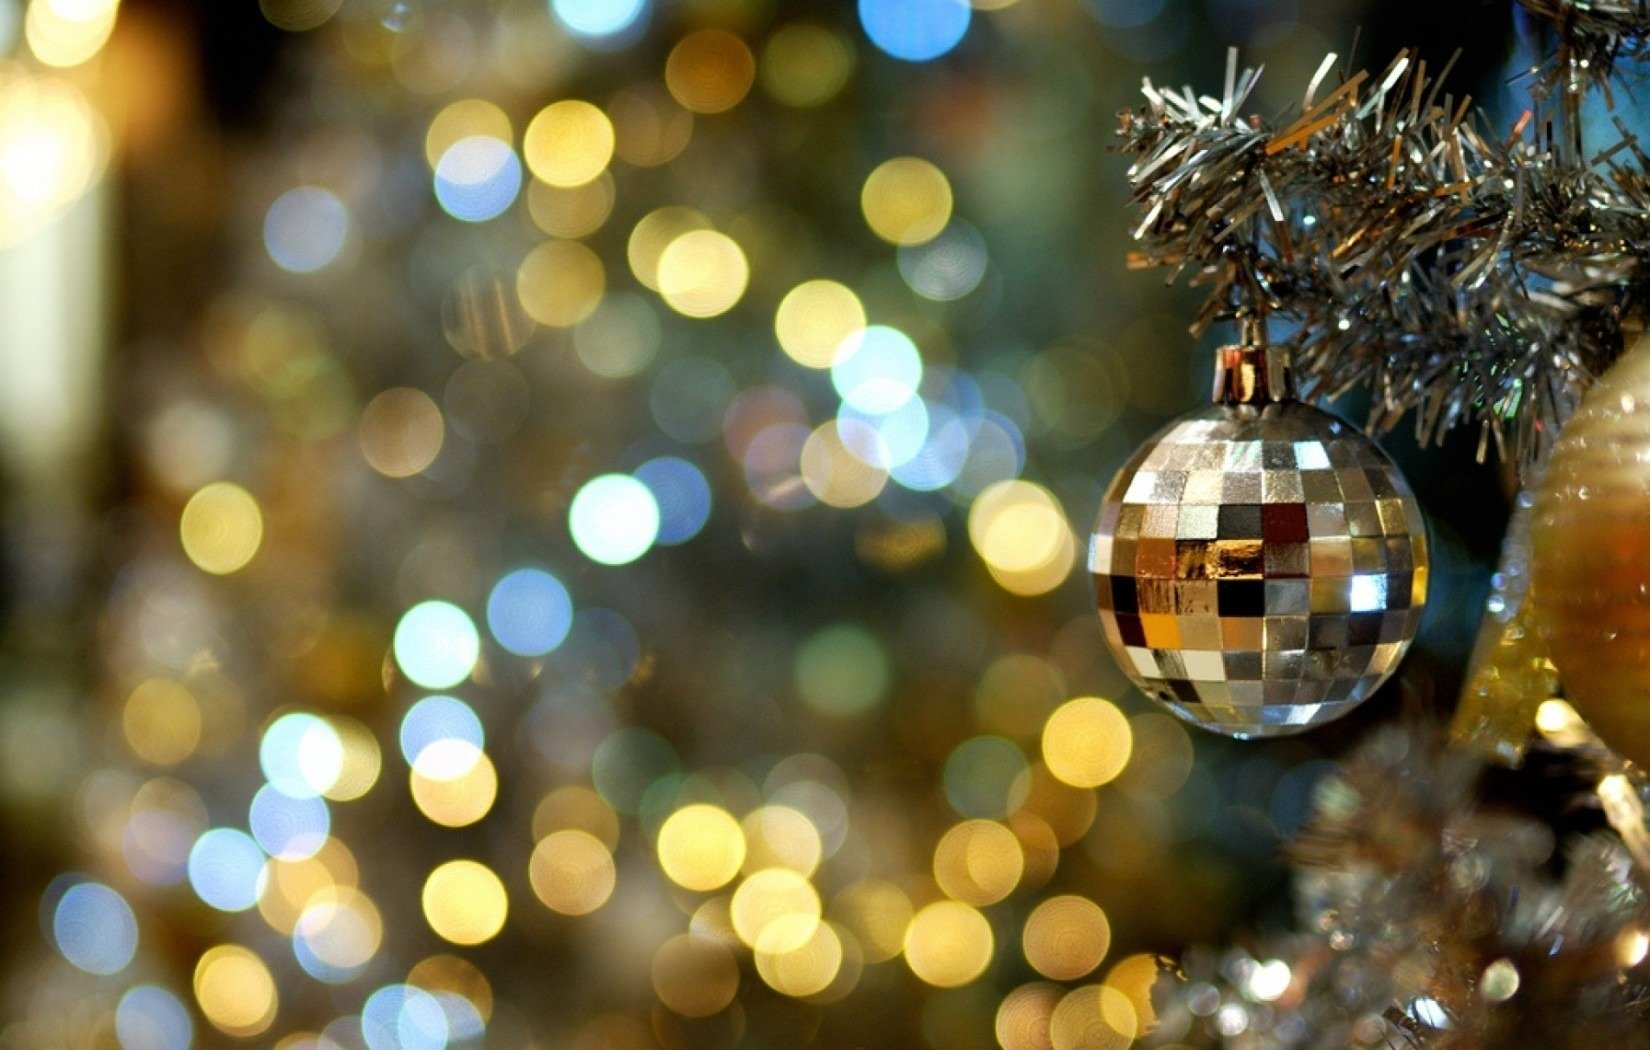 holiday lights celebration new year mood garlands magic decoration